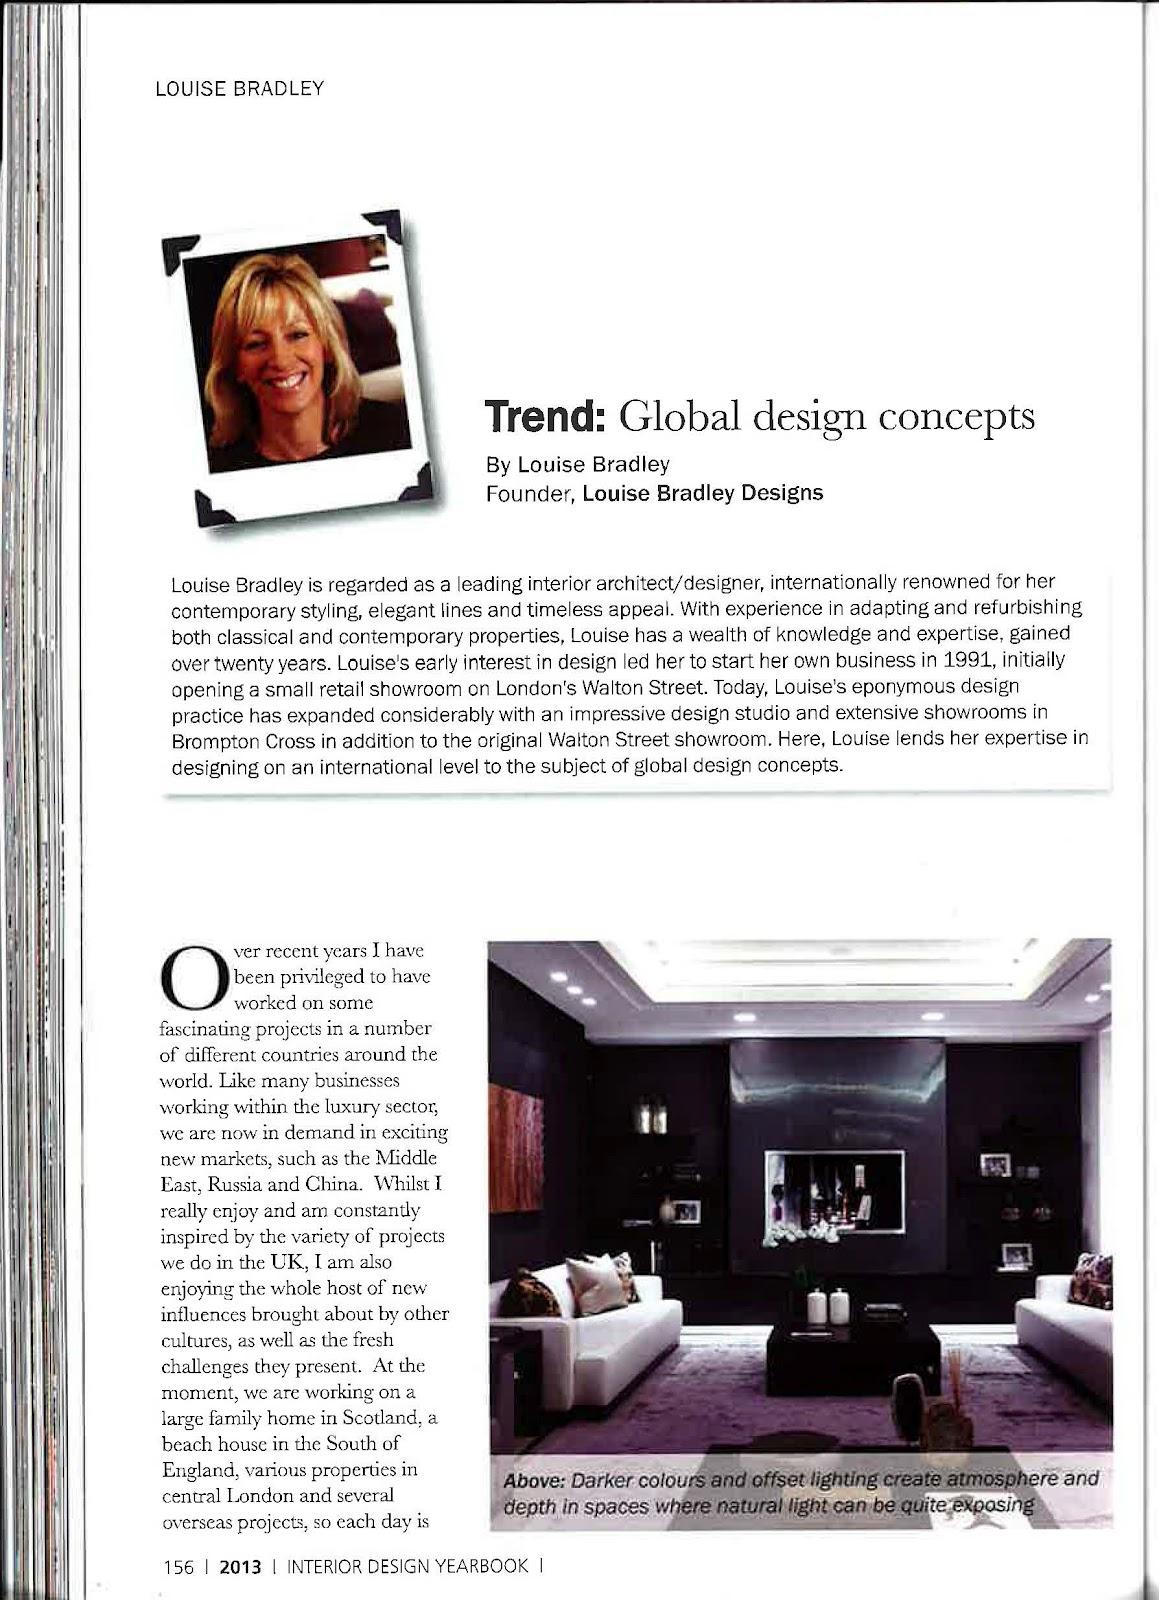 Interior design year book 2013 for Interior design yearbook